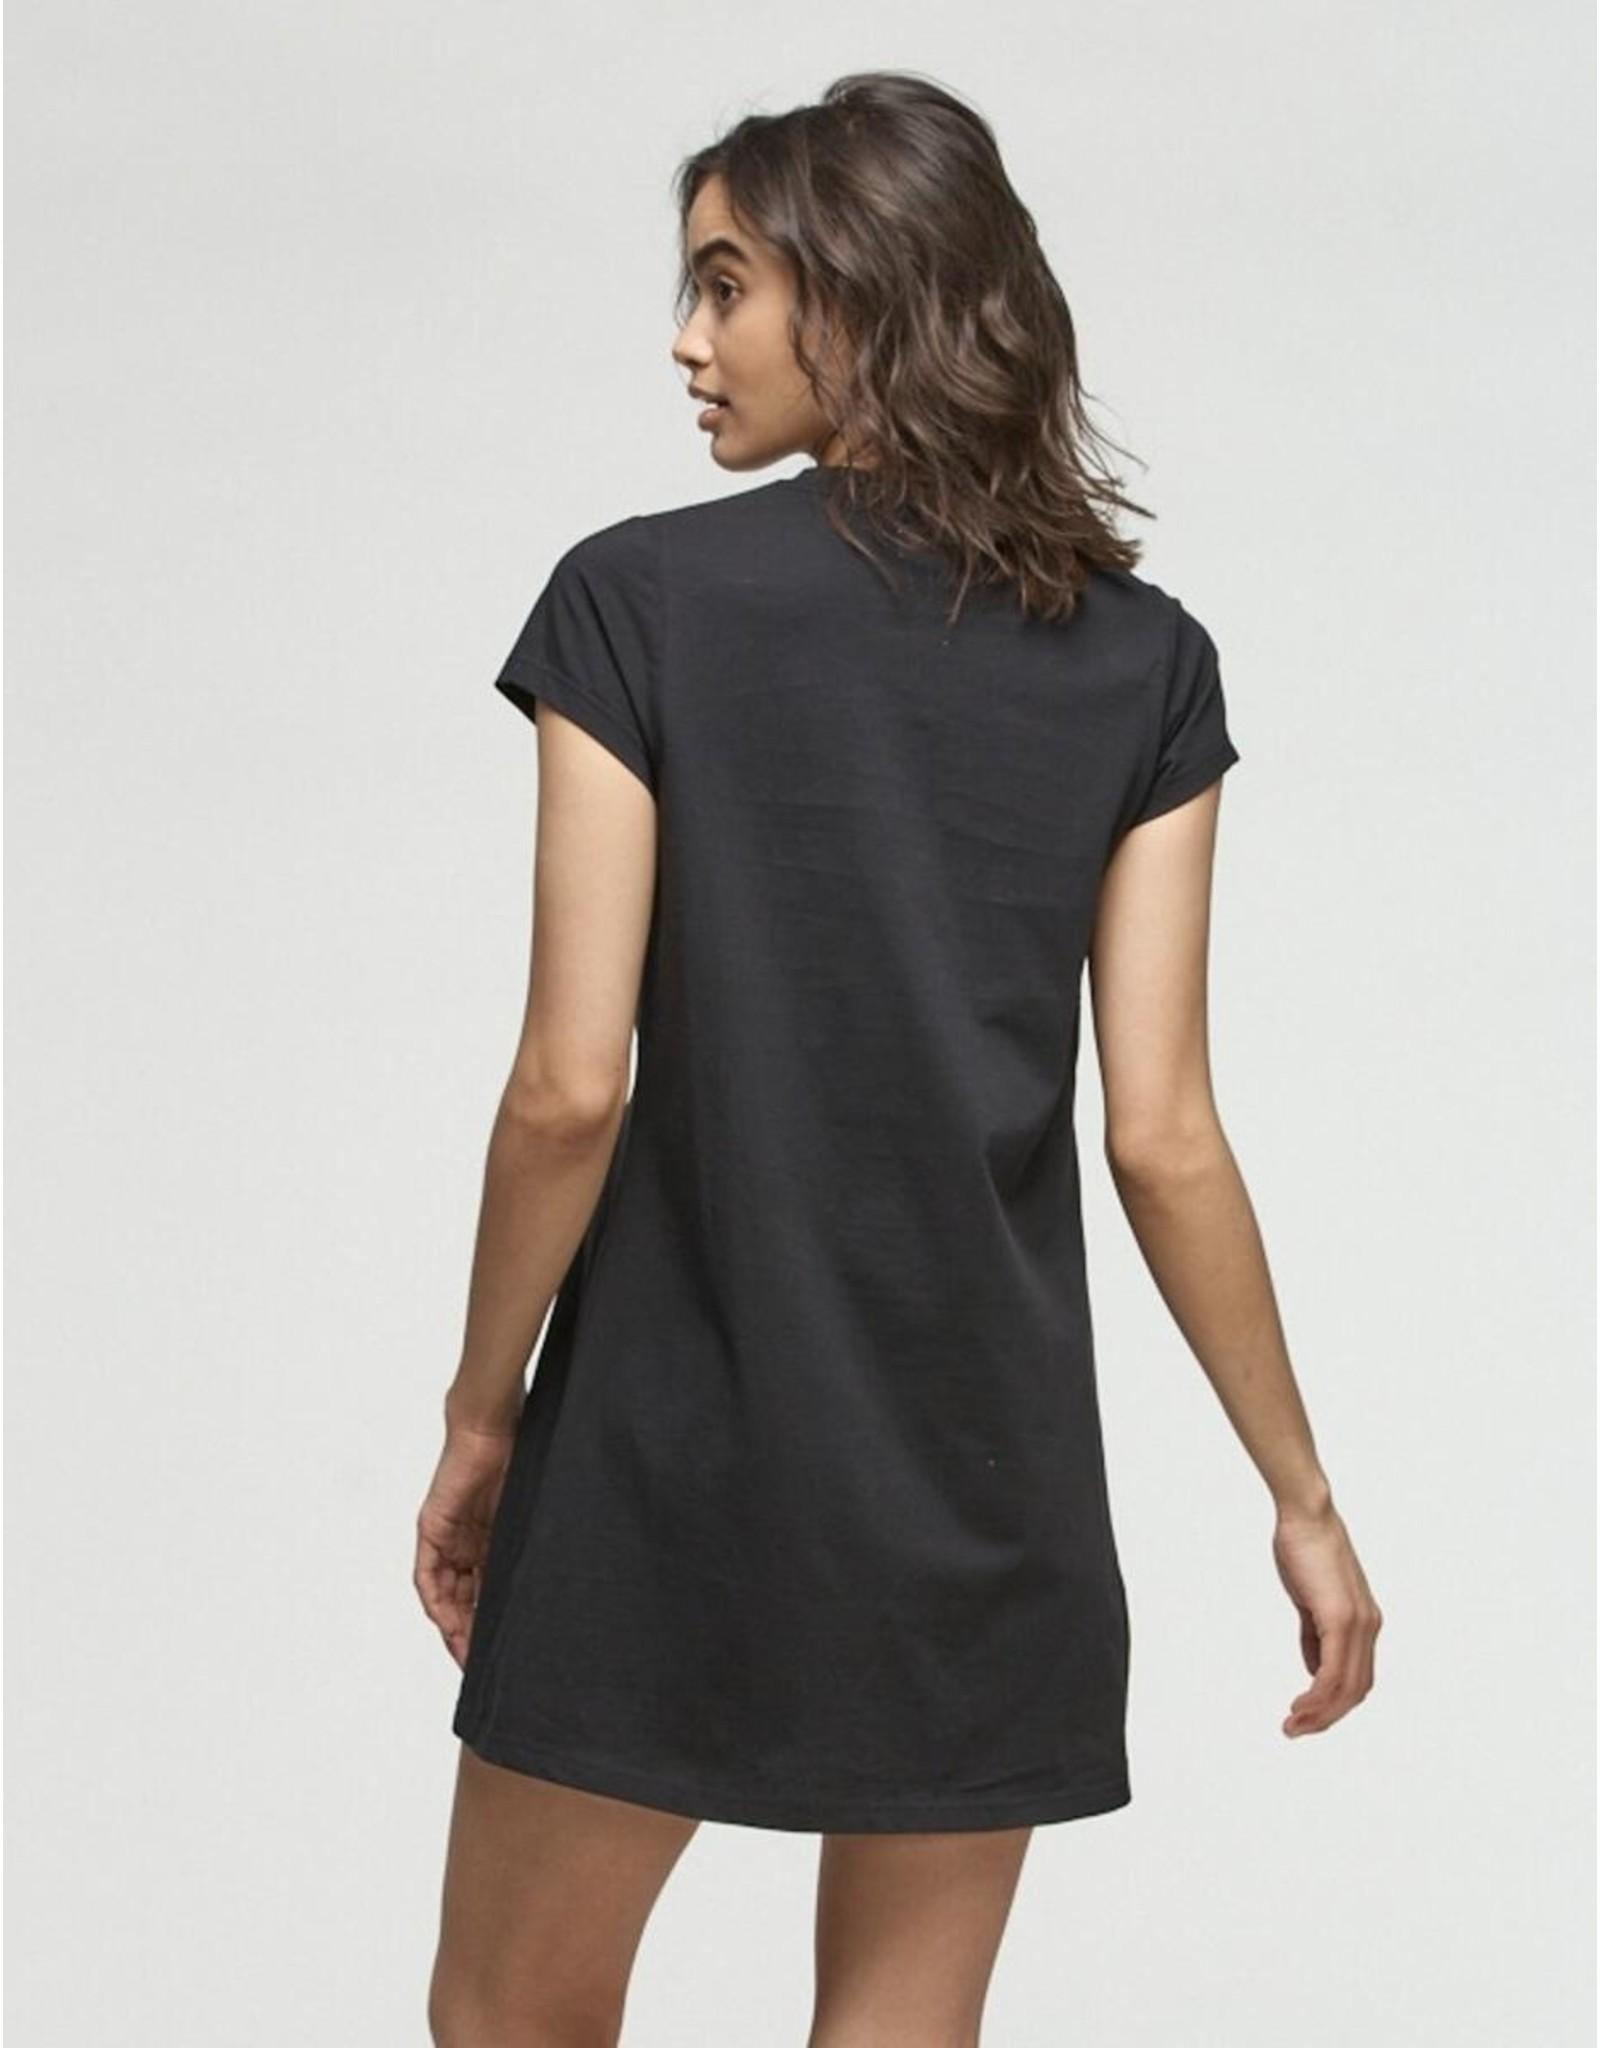 Kuwallatee T-Shirt Dress